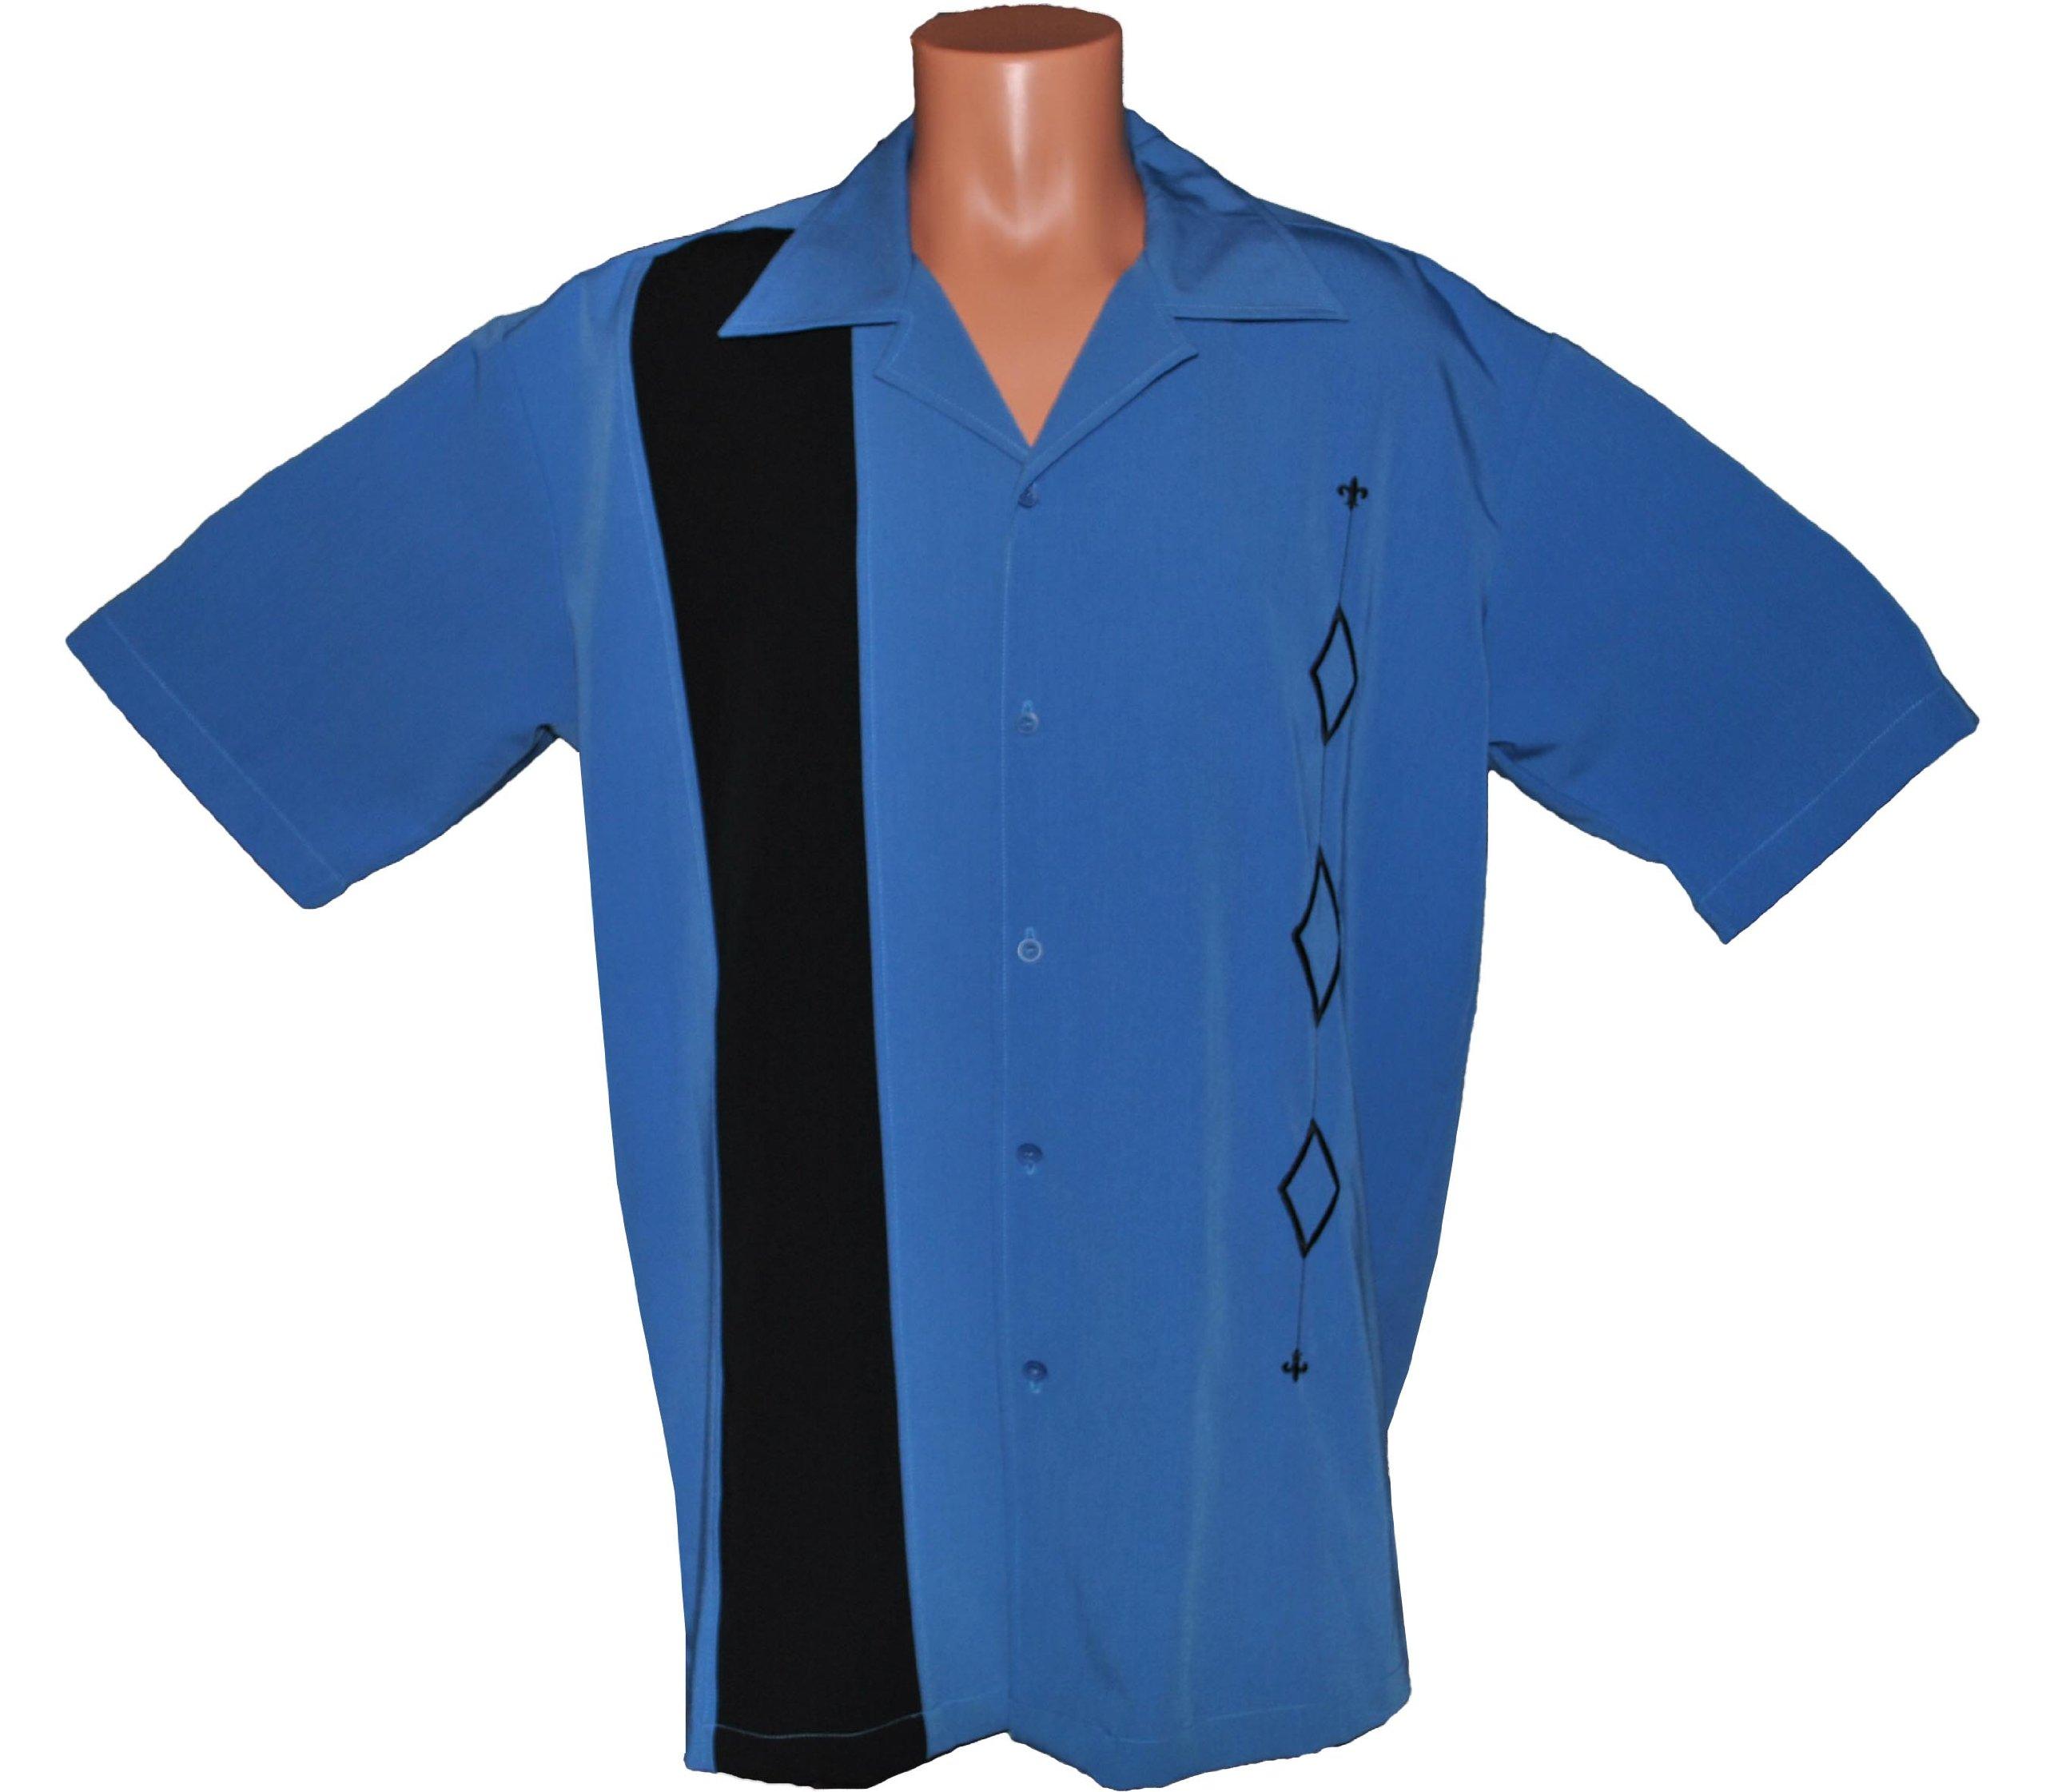 Retro Bowling Shirt, BIG & TALL sizes. Mens ALASKA BLUE Casual Shirt, Size XL-Tall